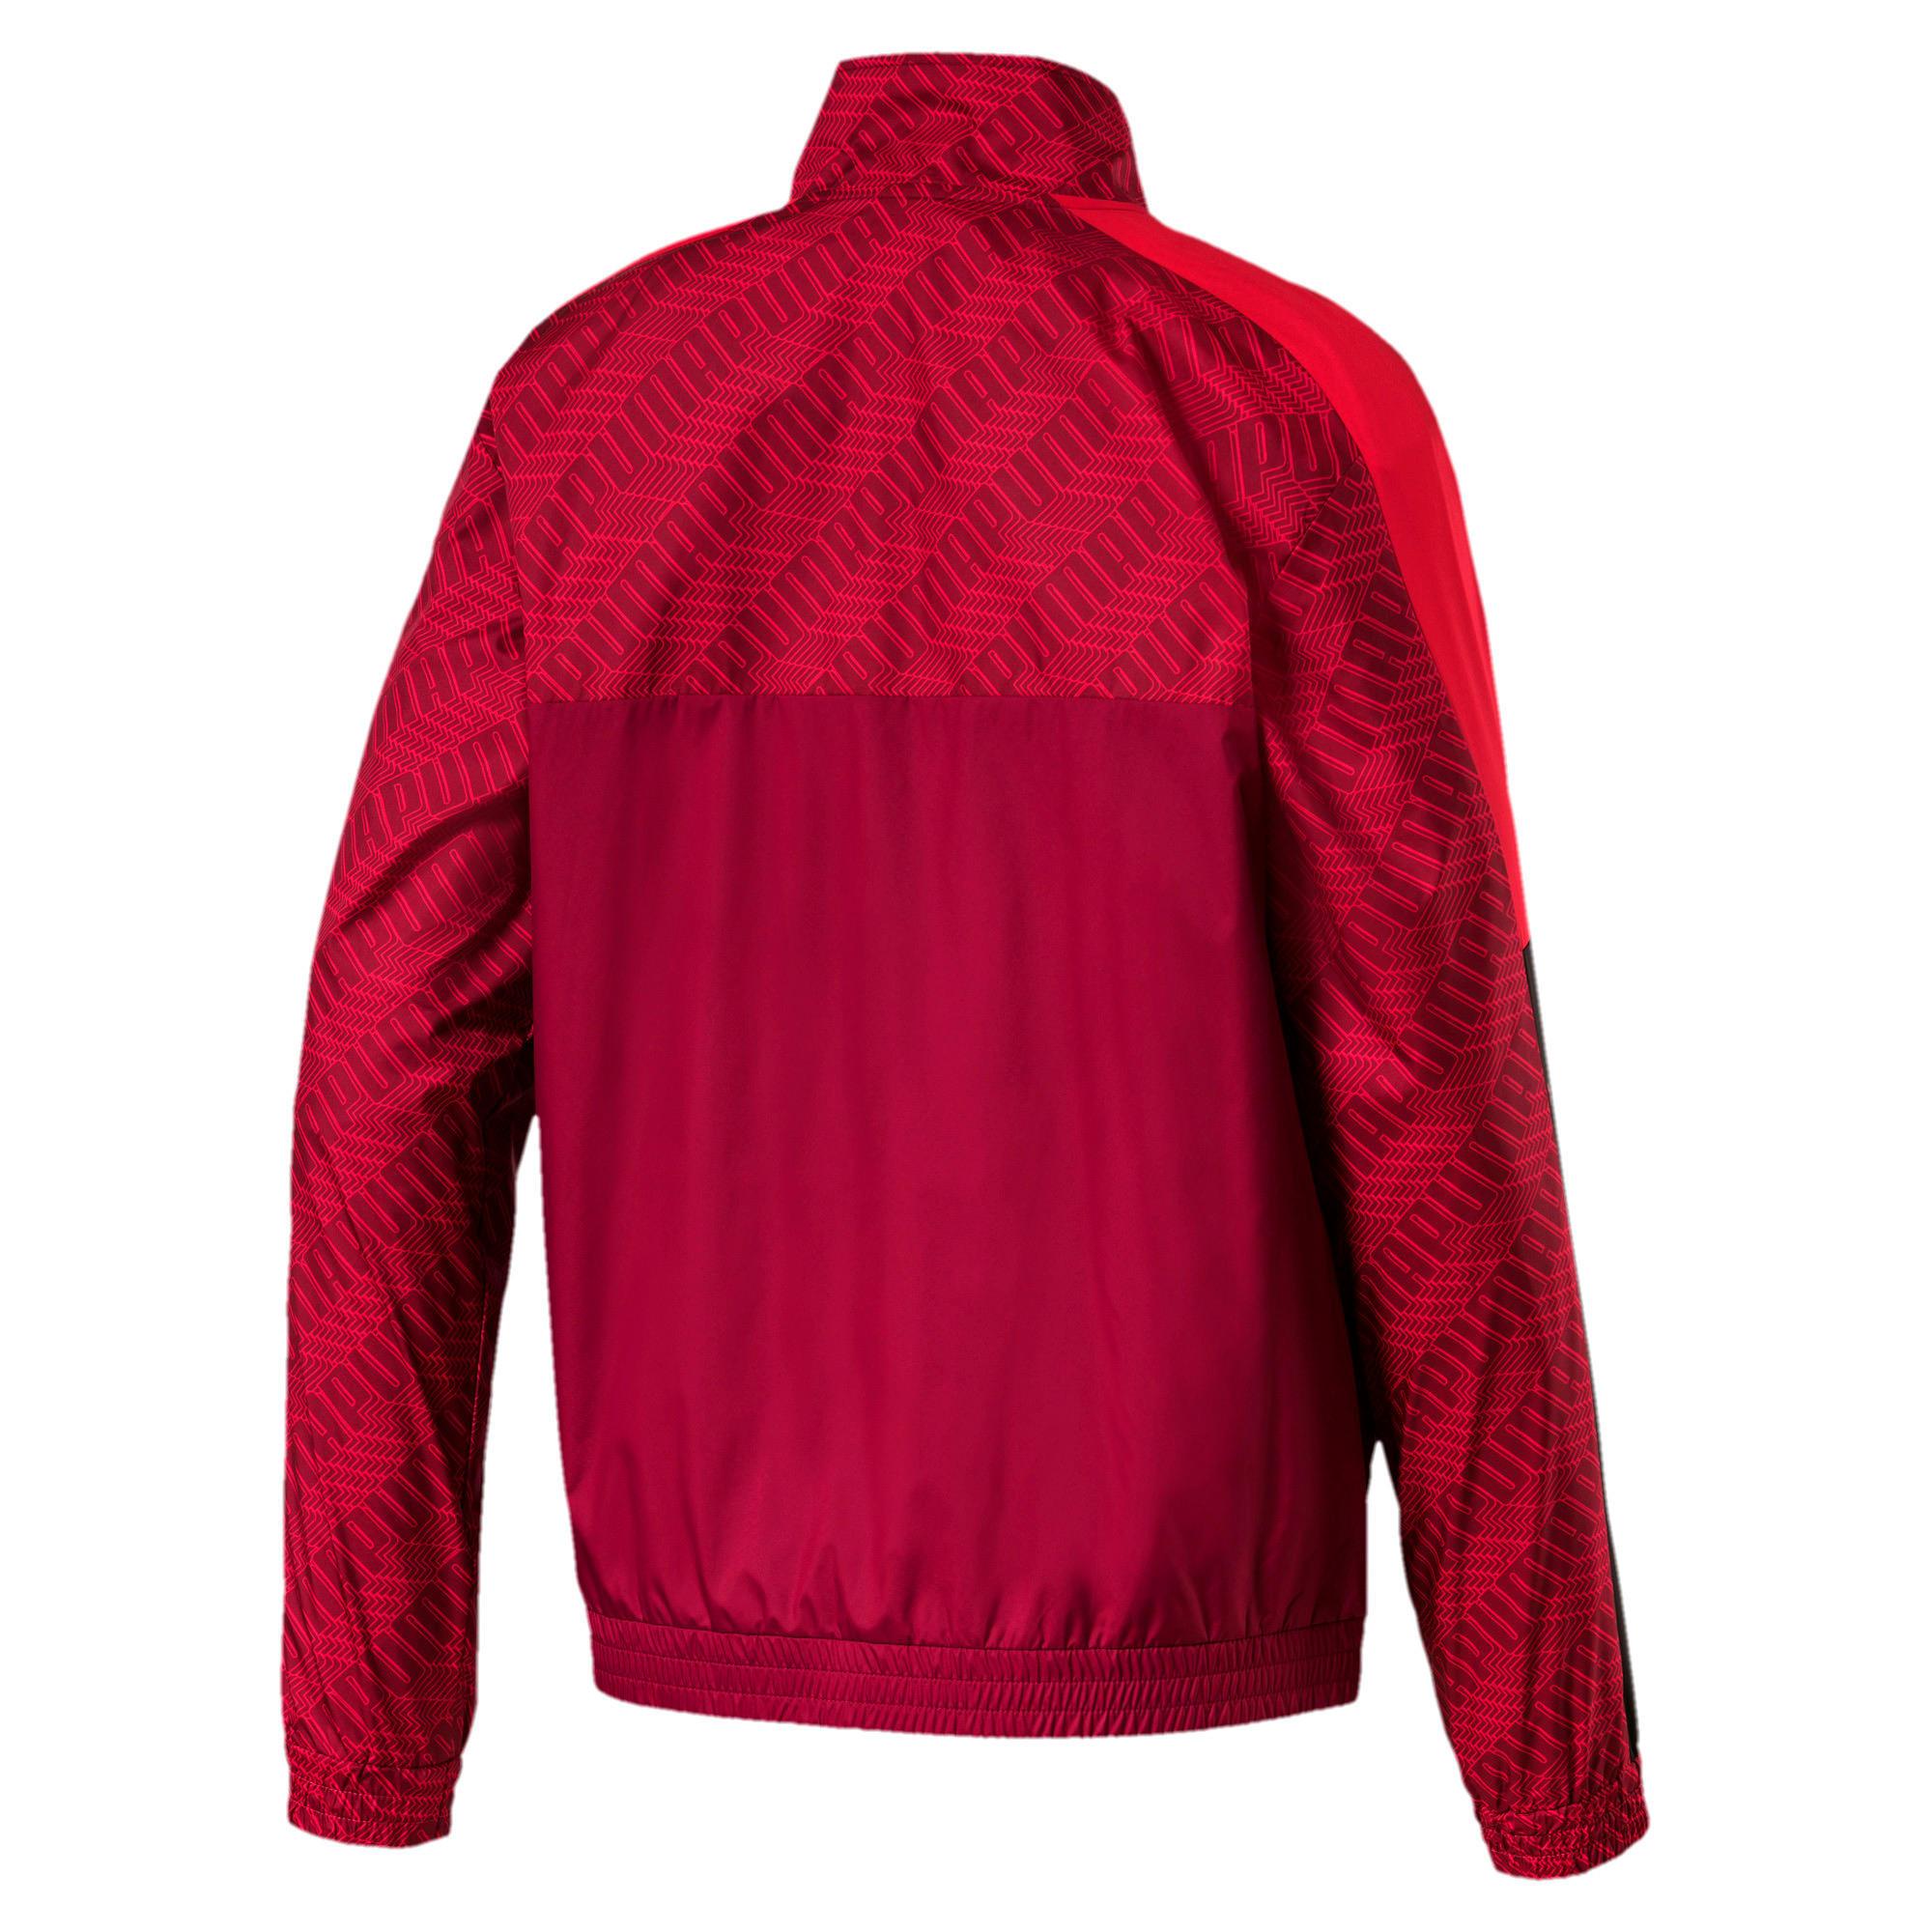 Thumbnail 5 of T7 Men's AOP Track Jacket, Rhubarb-Repeat logo, medium